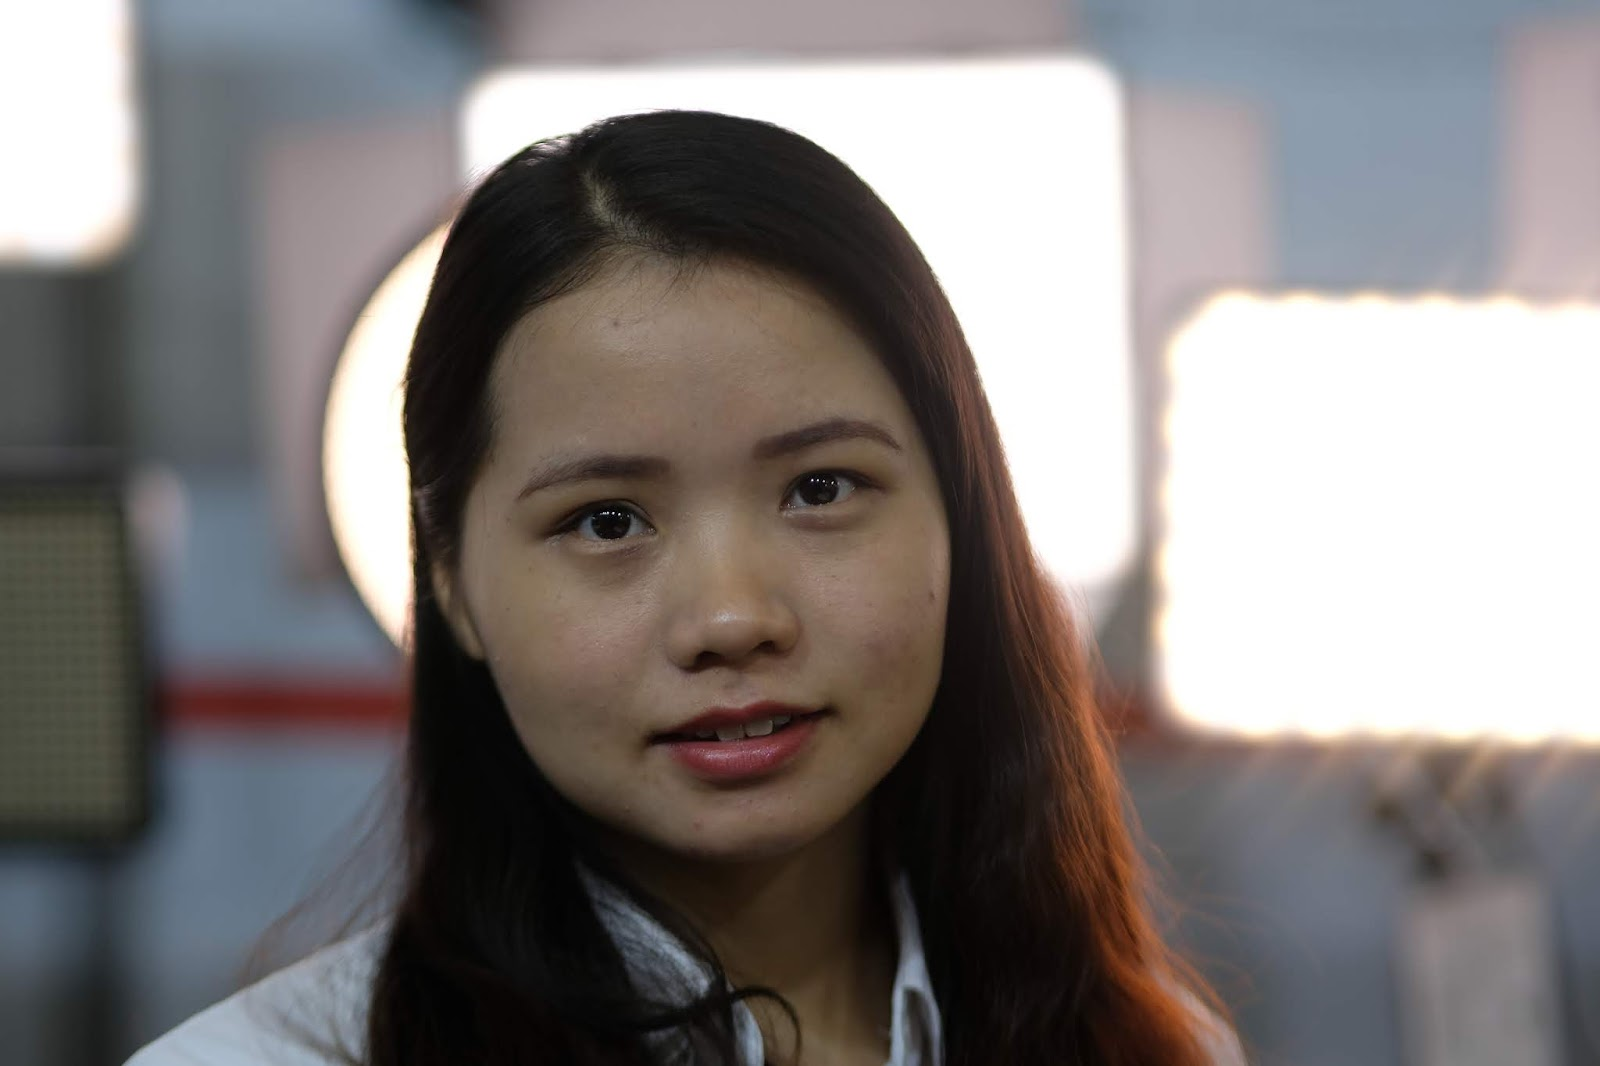 Портрет, снято на Viltrox 85mm f/1.8 для Fujifilm X